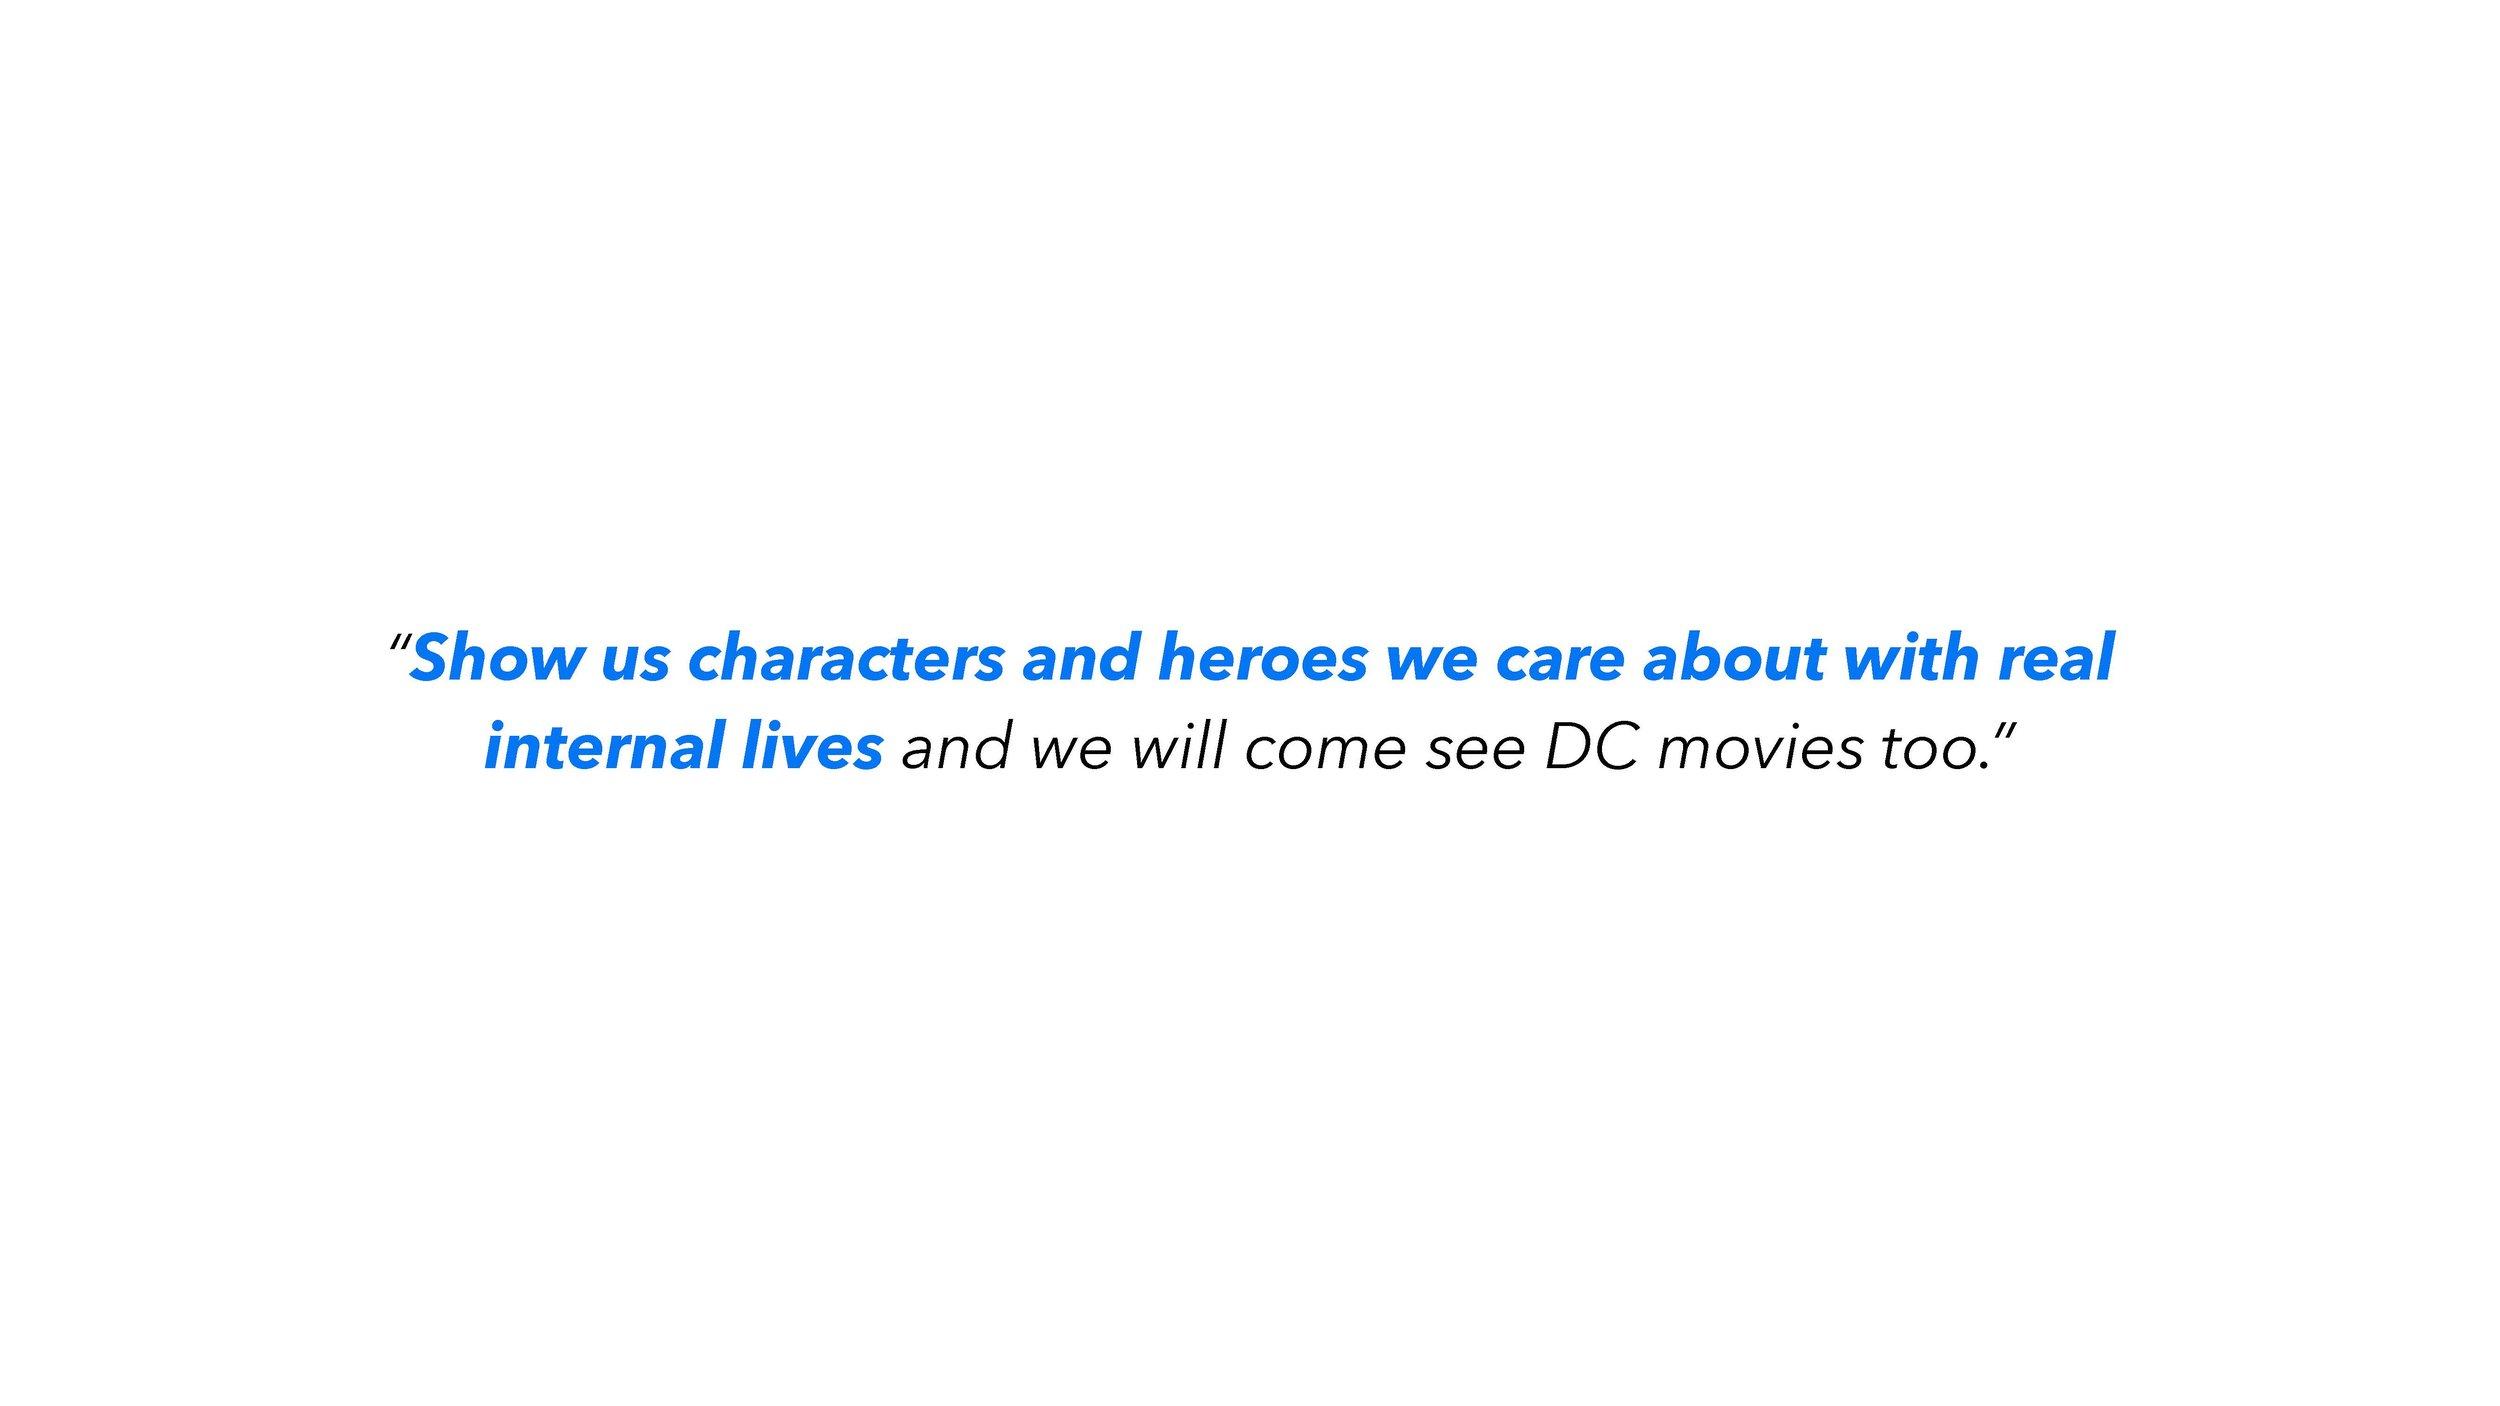 DC SUPERHEROS PRESENTATION-IMAGES_Page_24.jpg